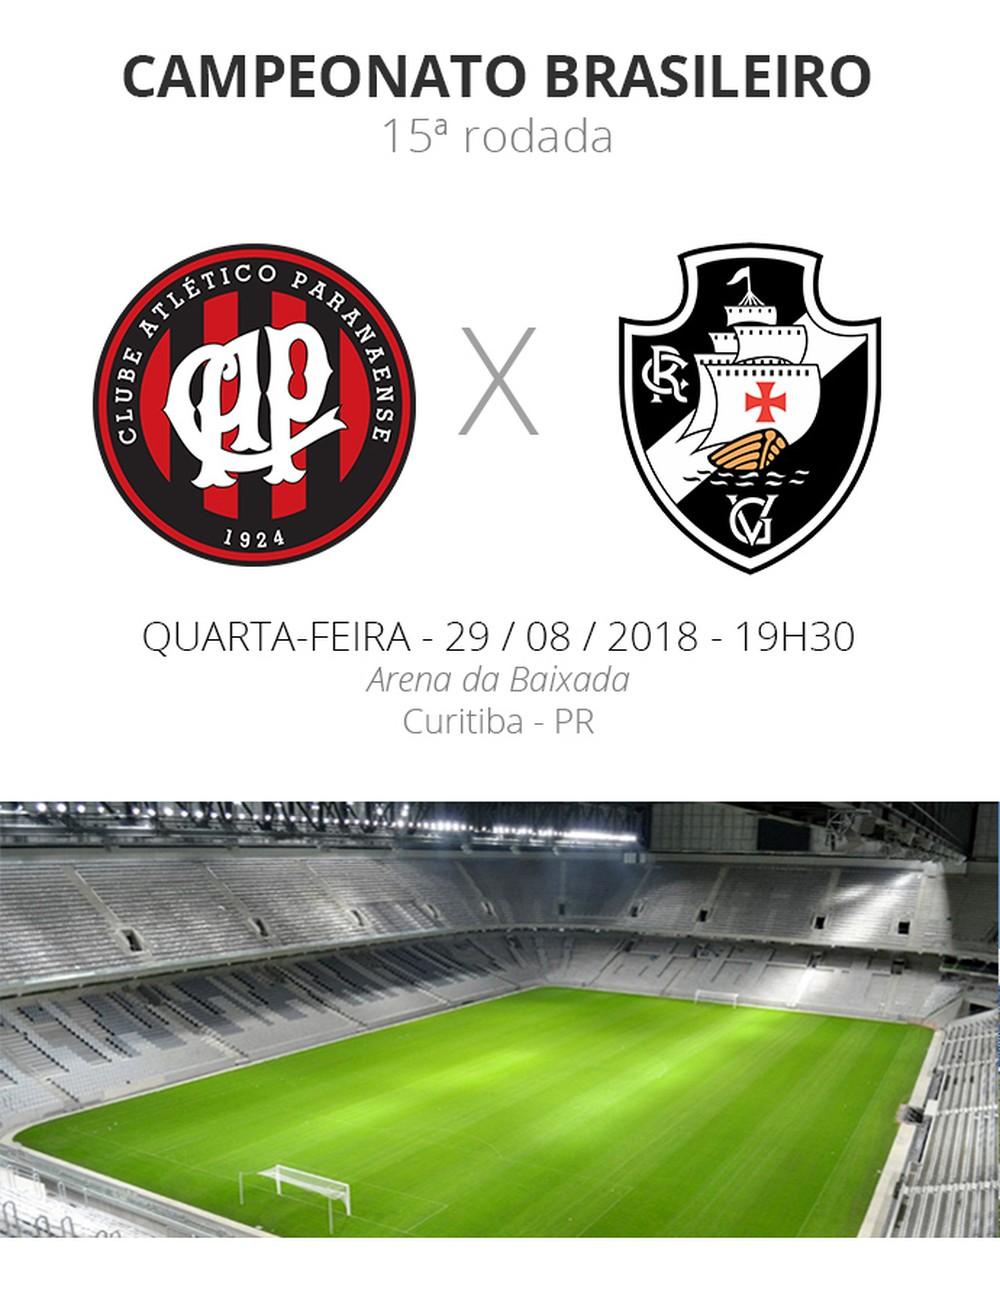 9759fdad61e86 Vasco News - Vasco Minha Vida  08 01 2018 - 09 01 2018